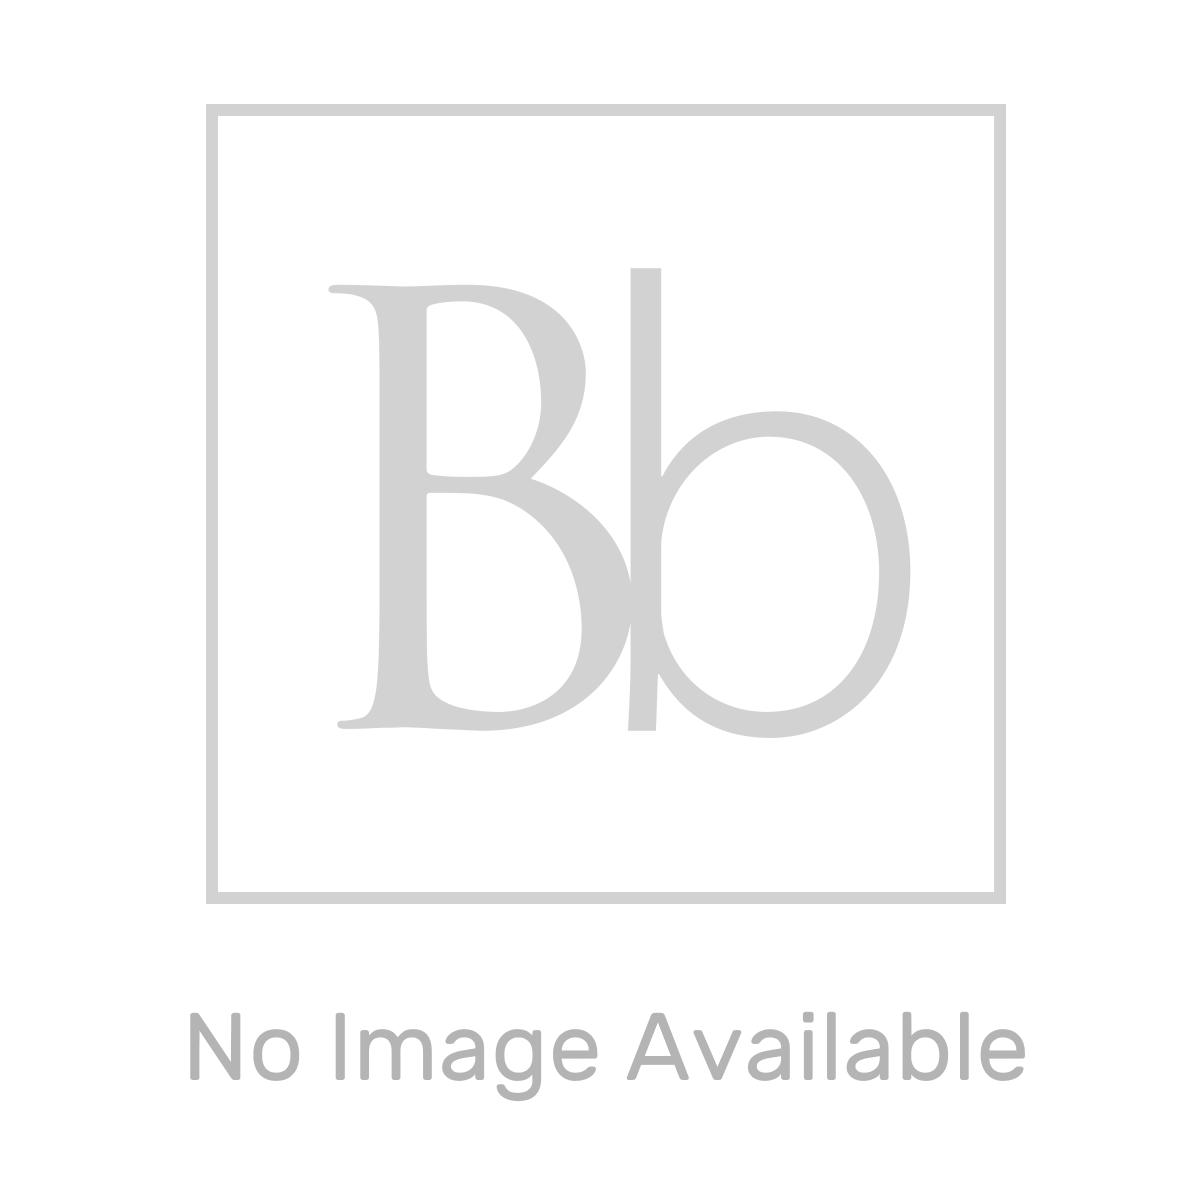 McAlpine R3M 19/23mm Universal Overflow Tee